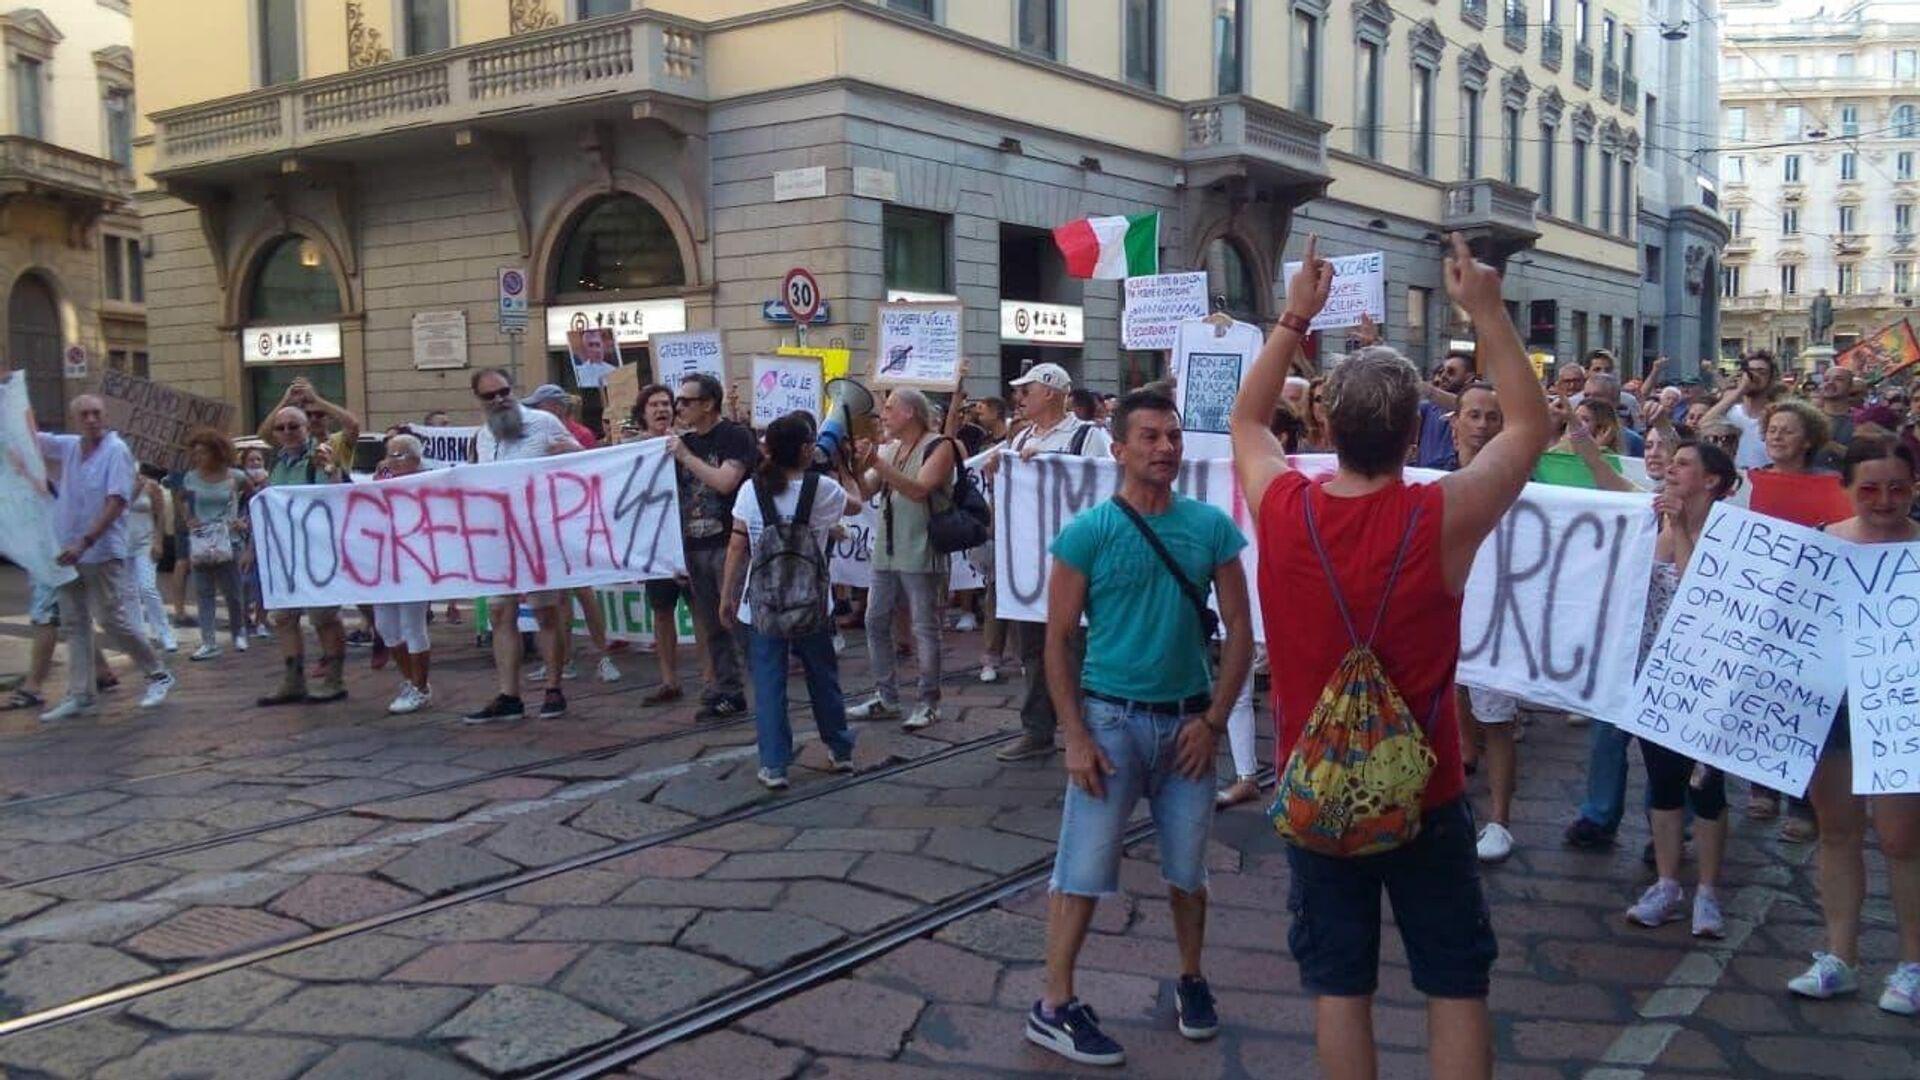 Manifestazione no Green pass a Milano  - Sputnik Italia, 1920, 20.08.2021